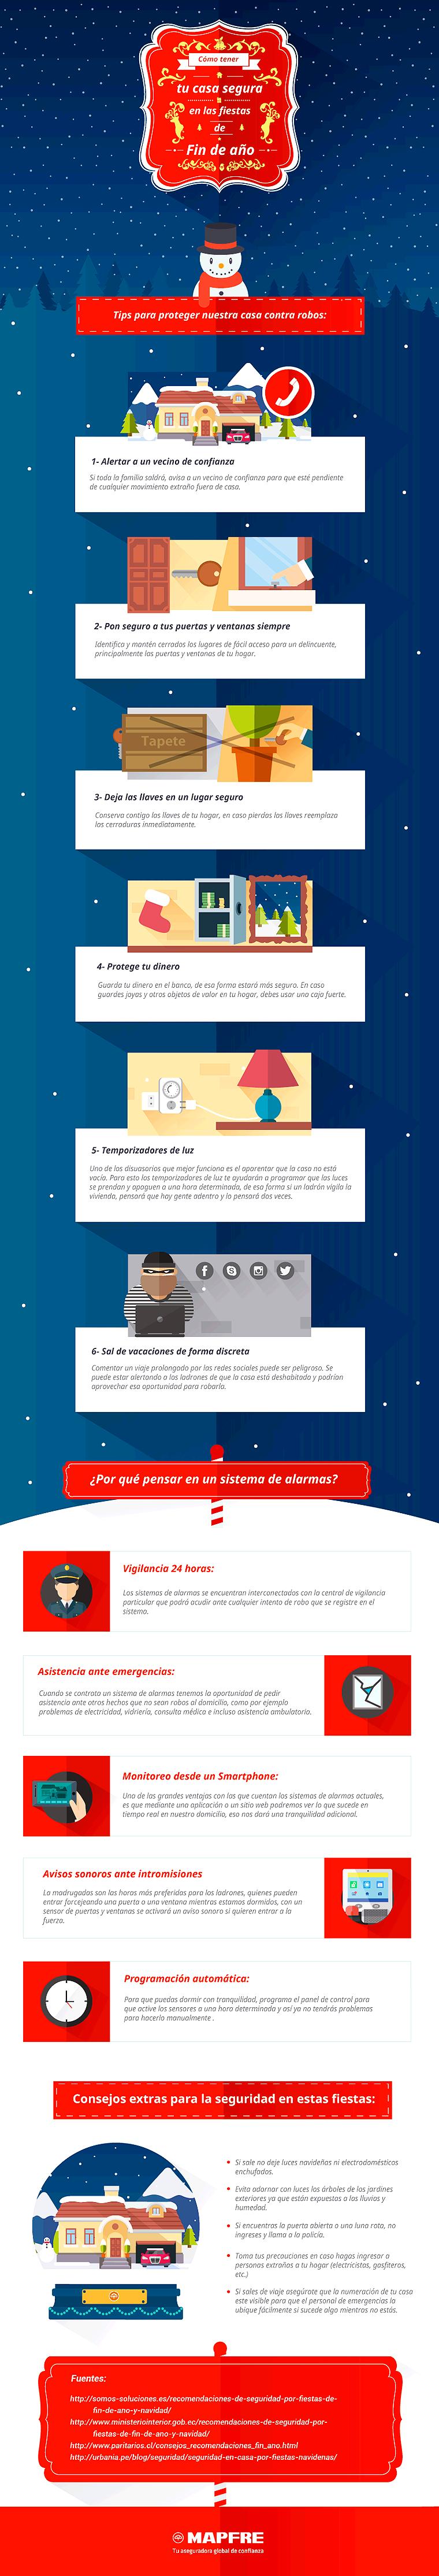 infografia-casasegura